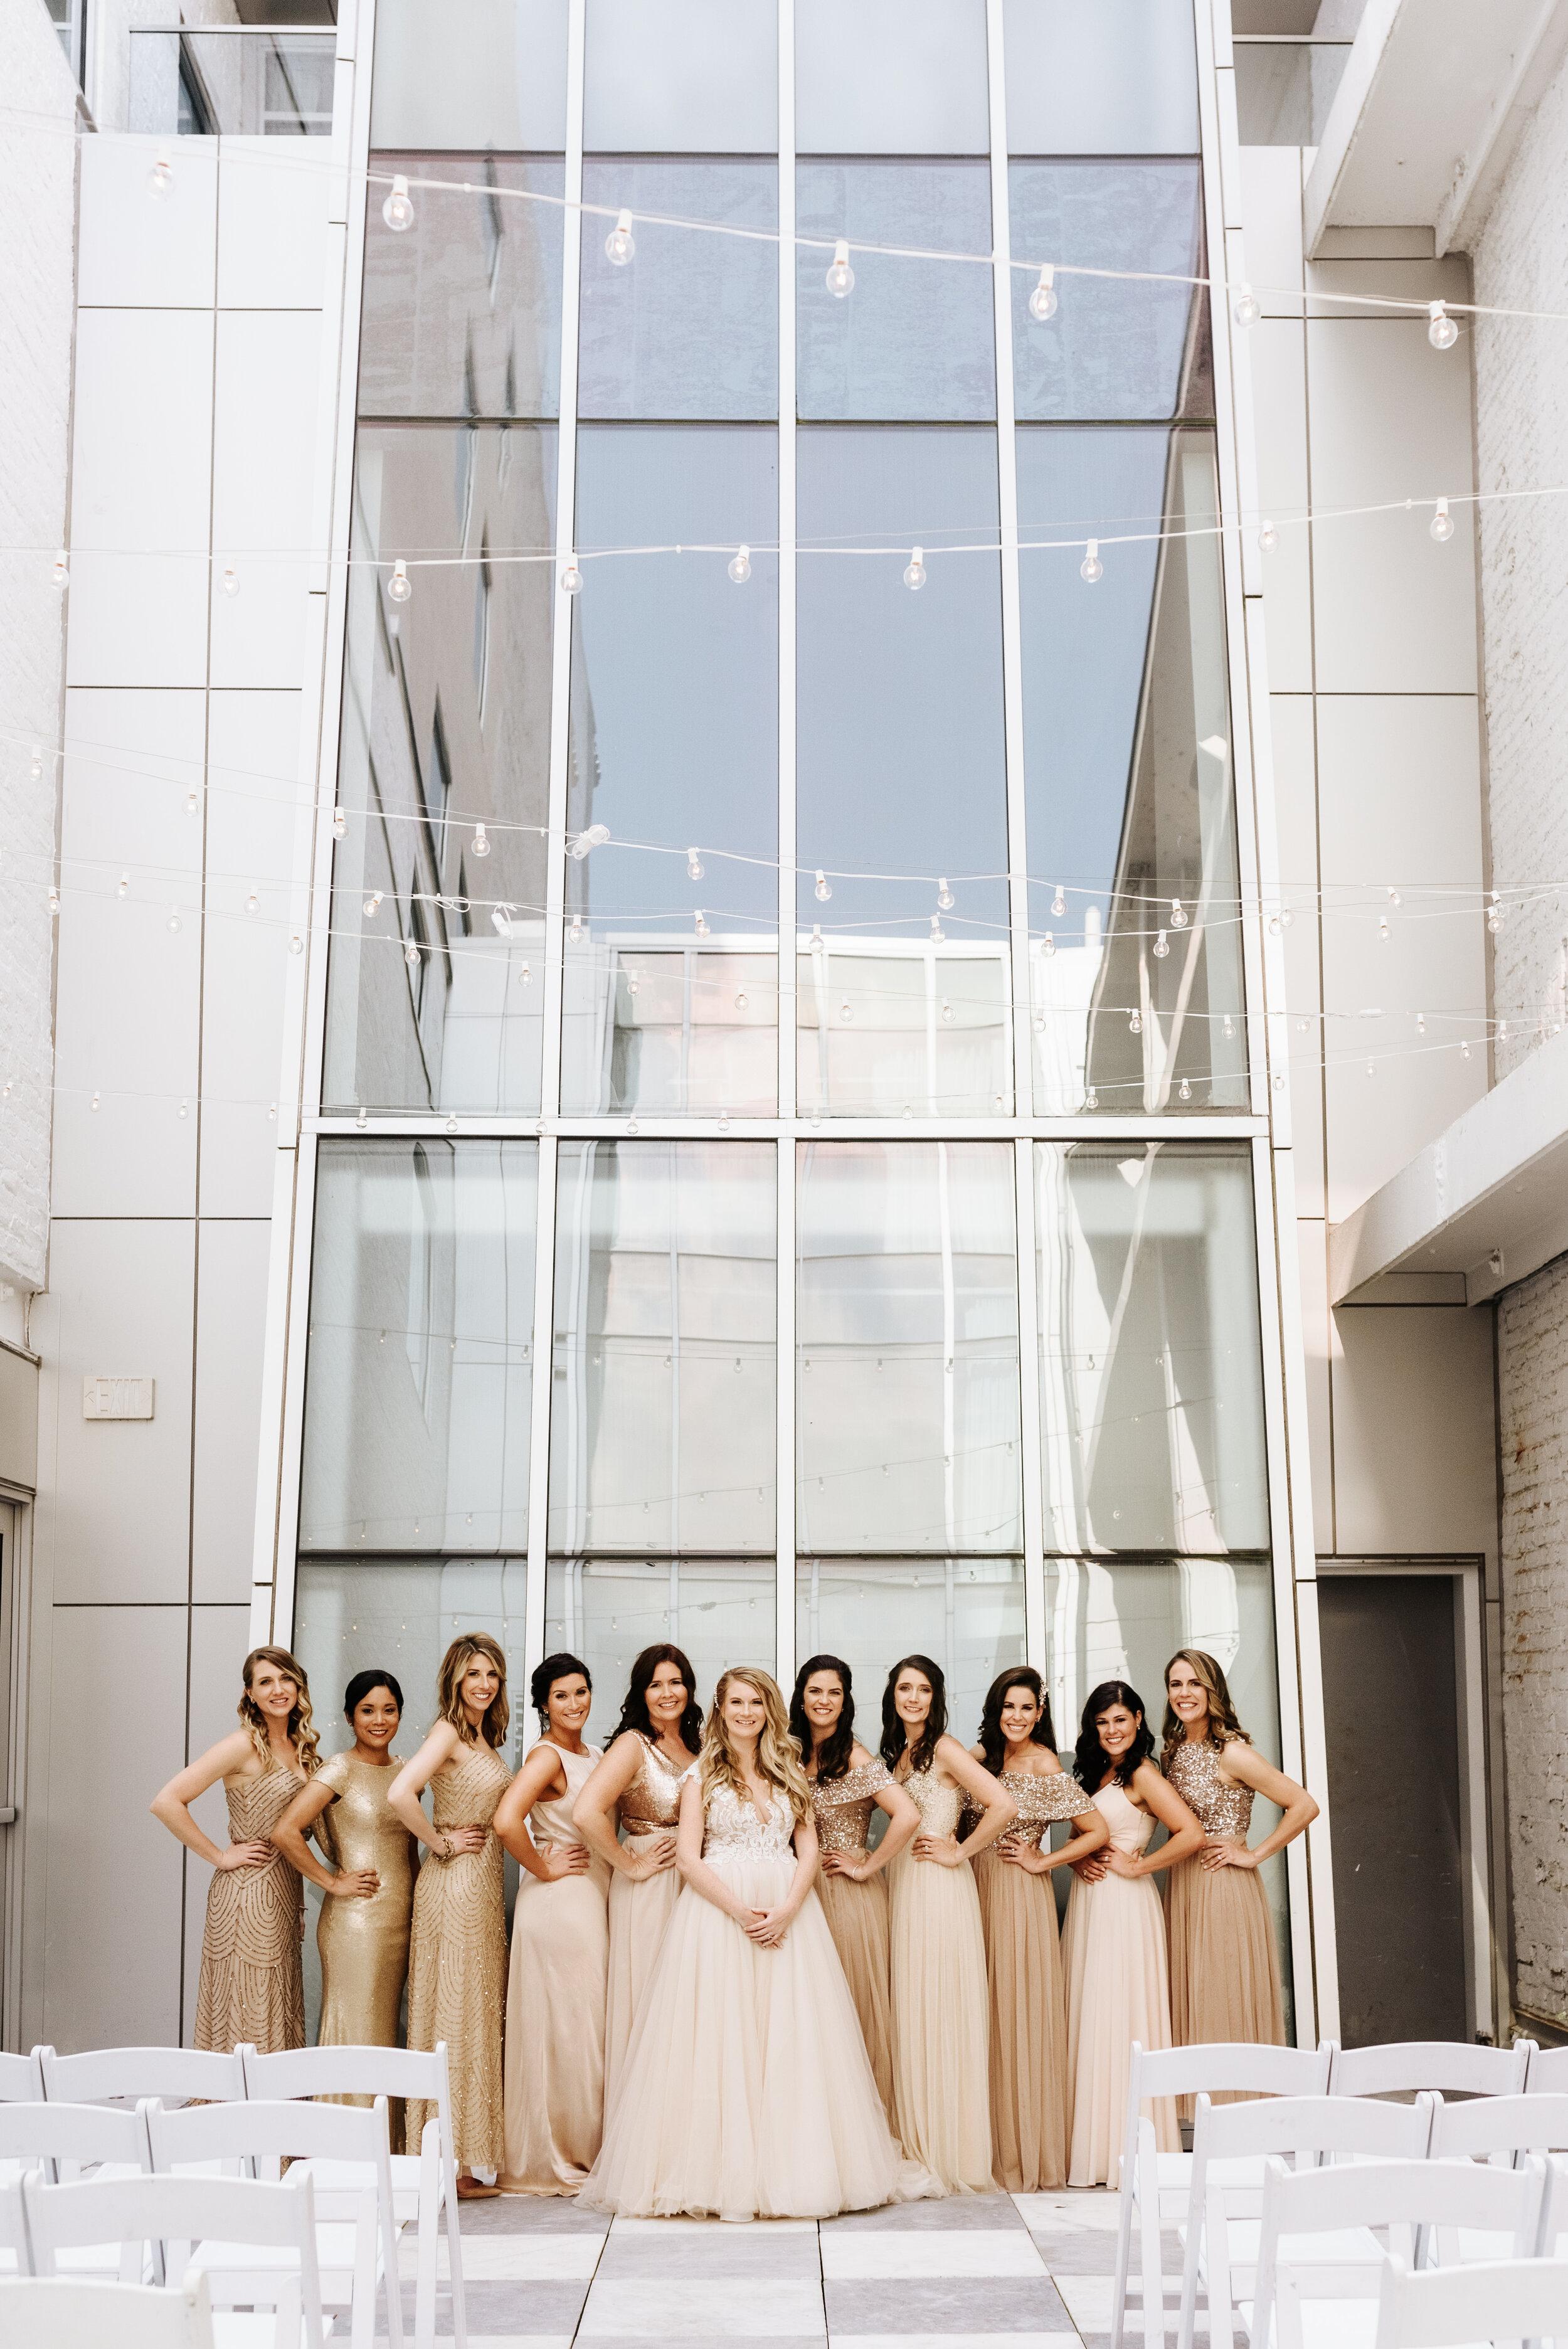 Cassie-Mrunal-Wedding-Quirk-Hotel-John-Marshall-Ballrooms-Richmond-Virginia-Photography-by-V-18.jpg